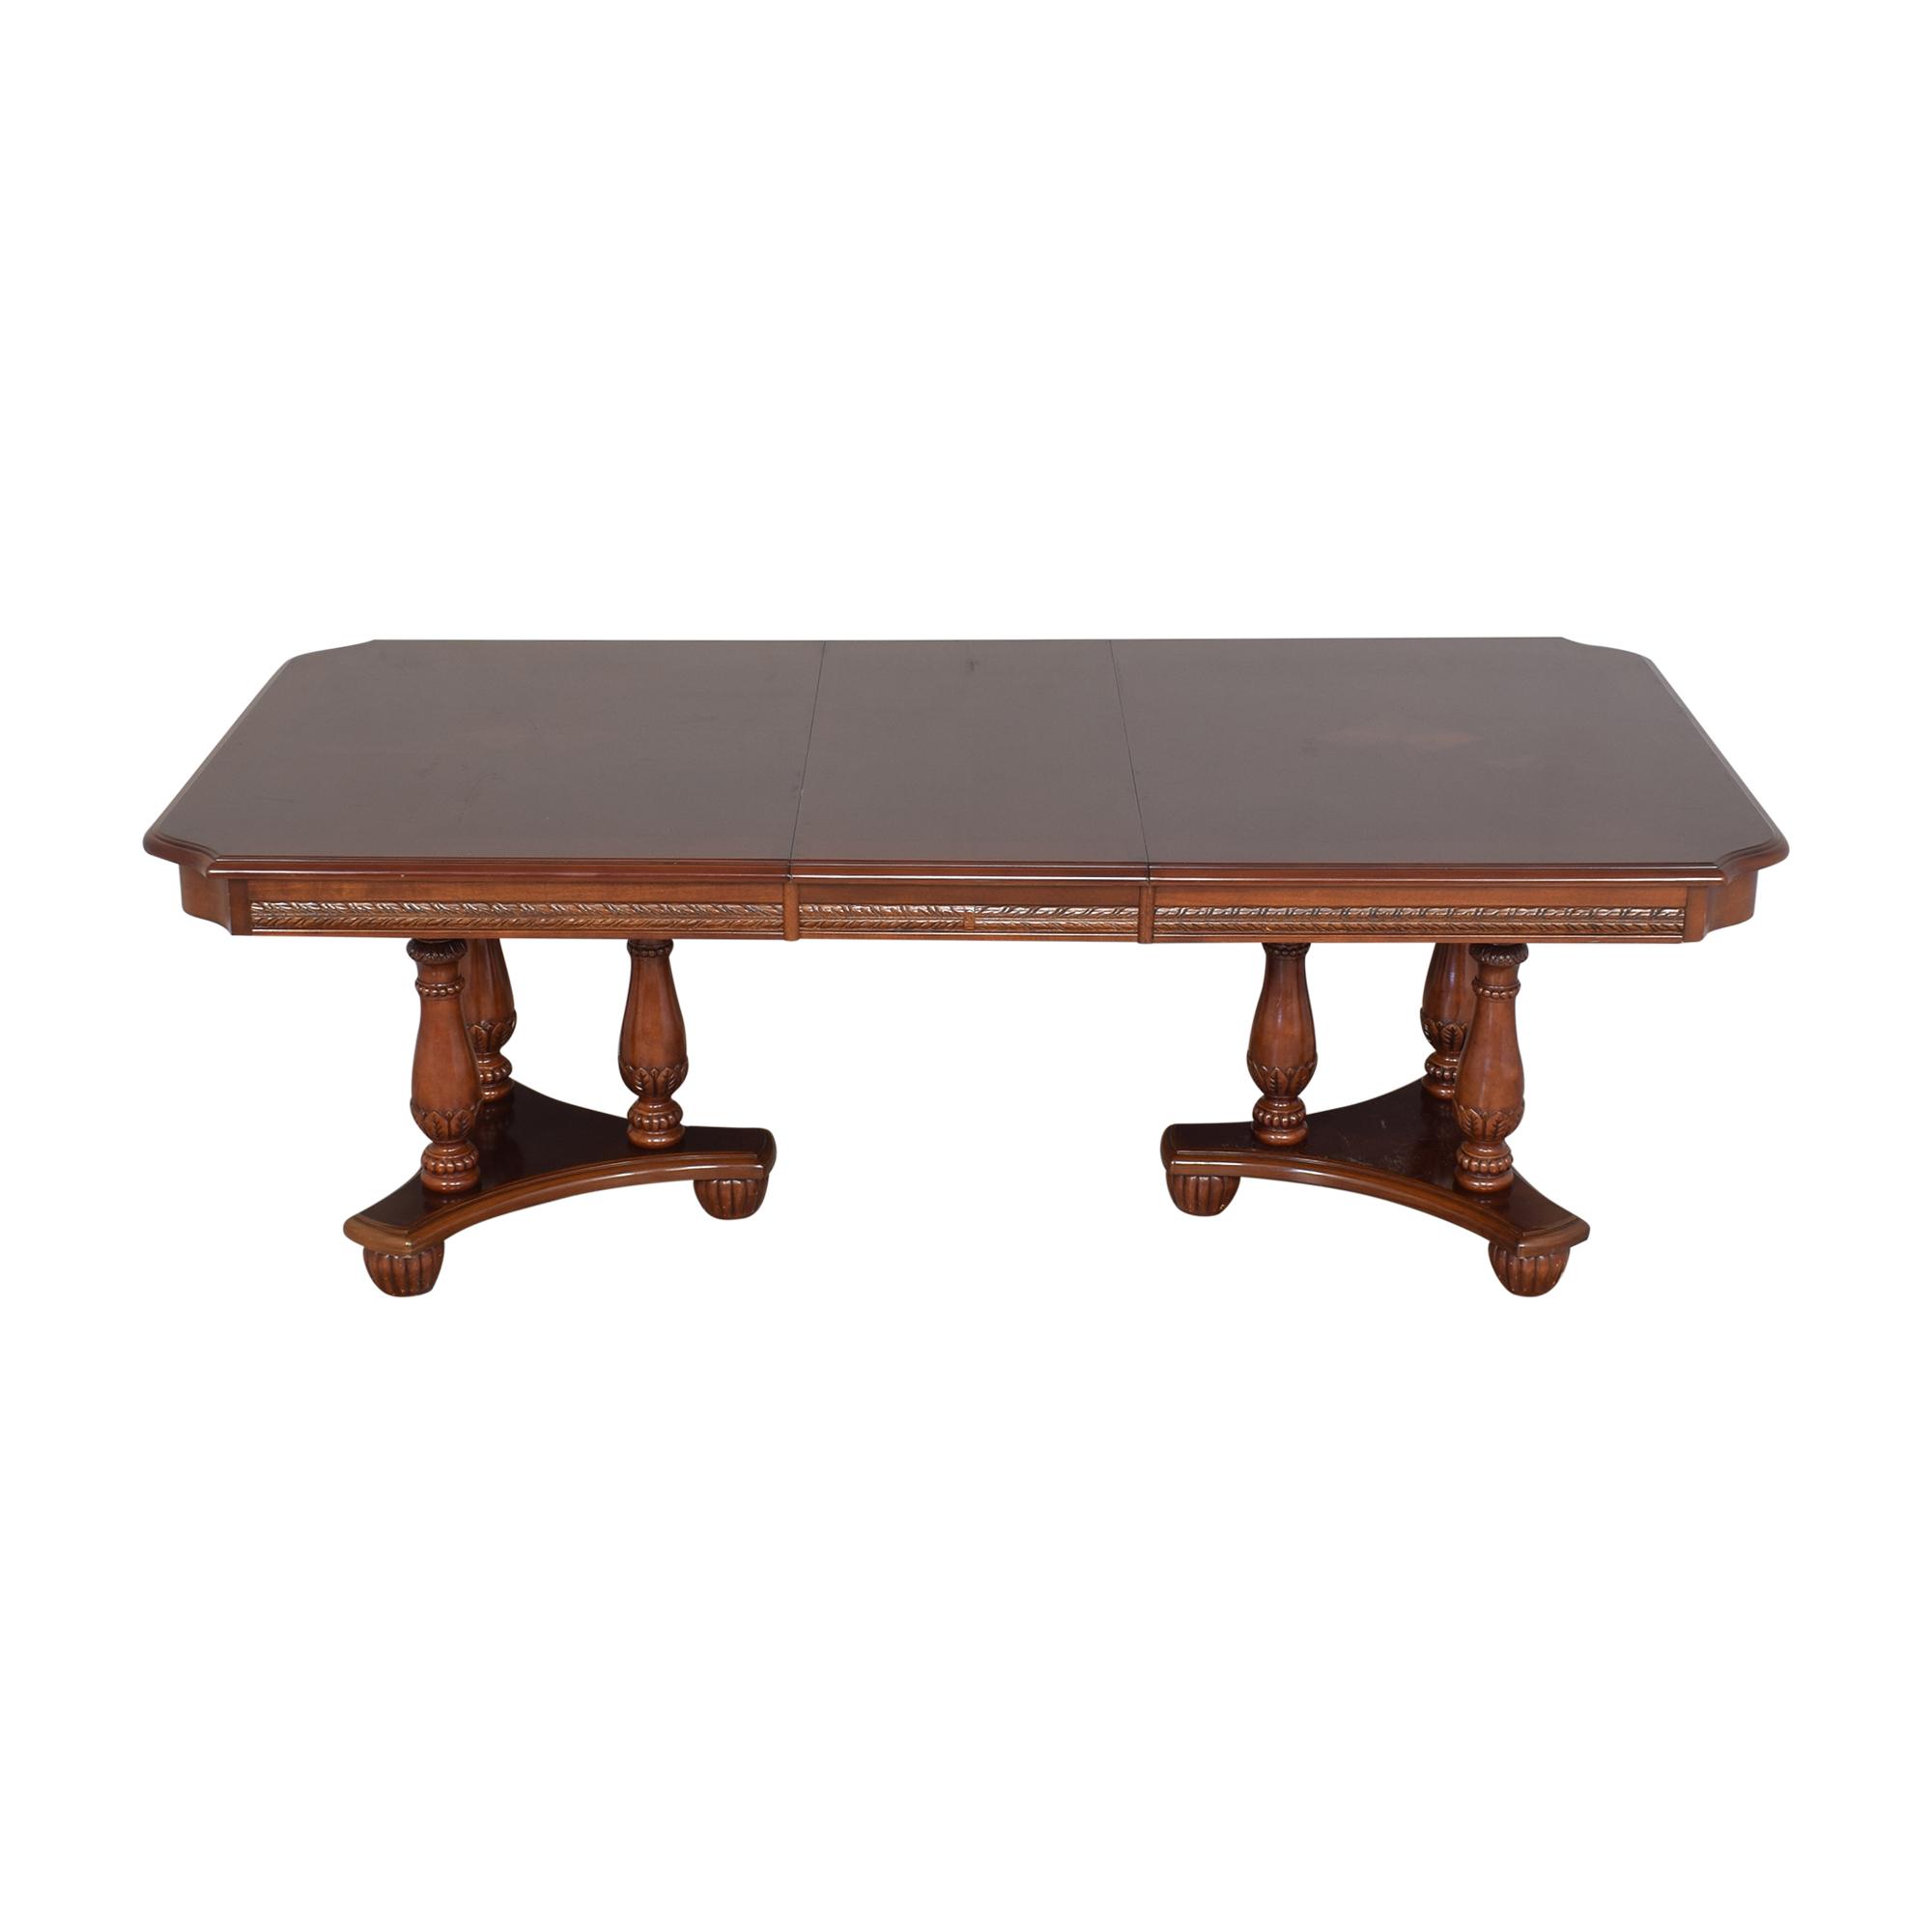 buy North Carolina Furniture Extendable Dining Table North Carolina Furniture Company Dinner Tables